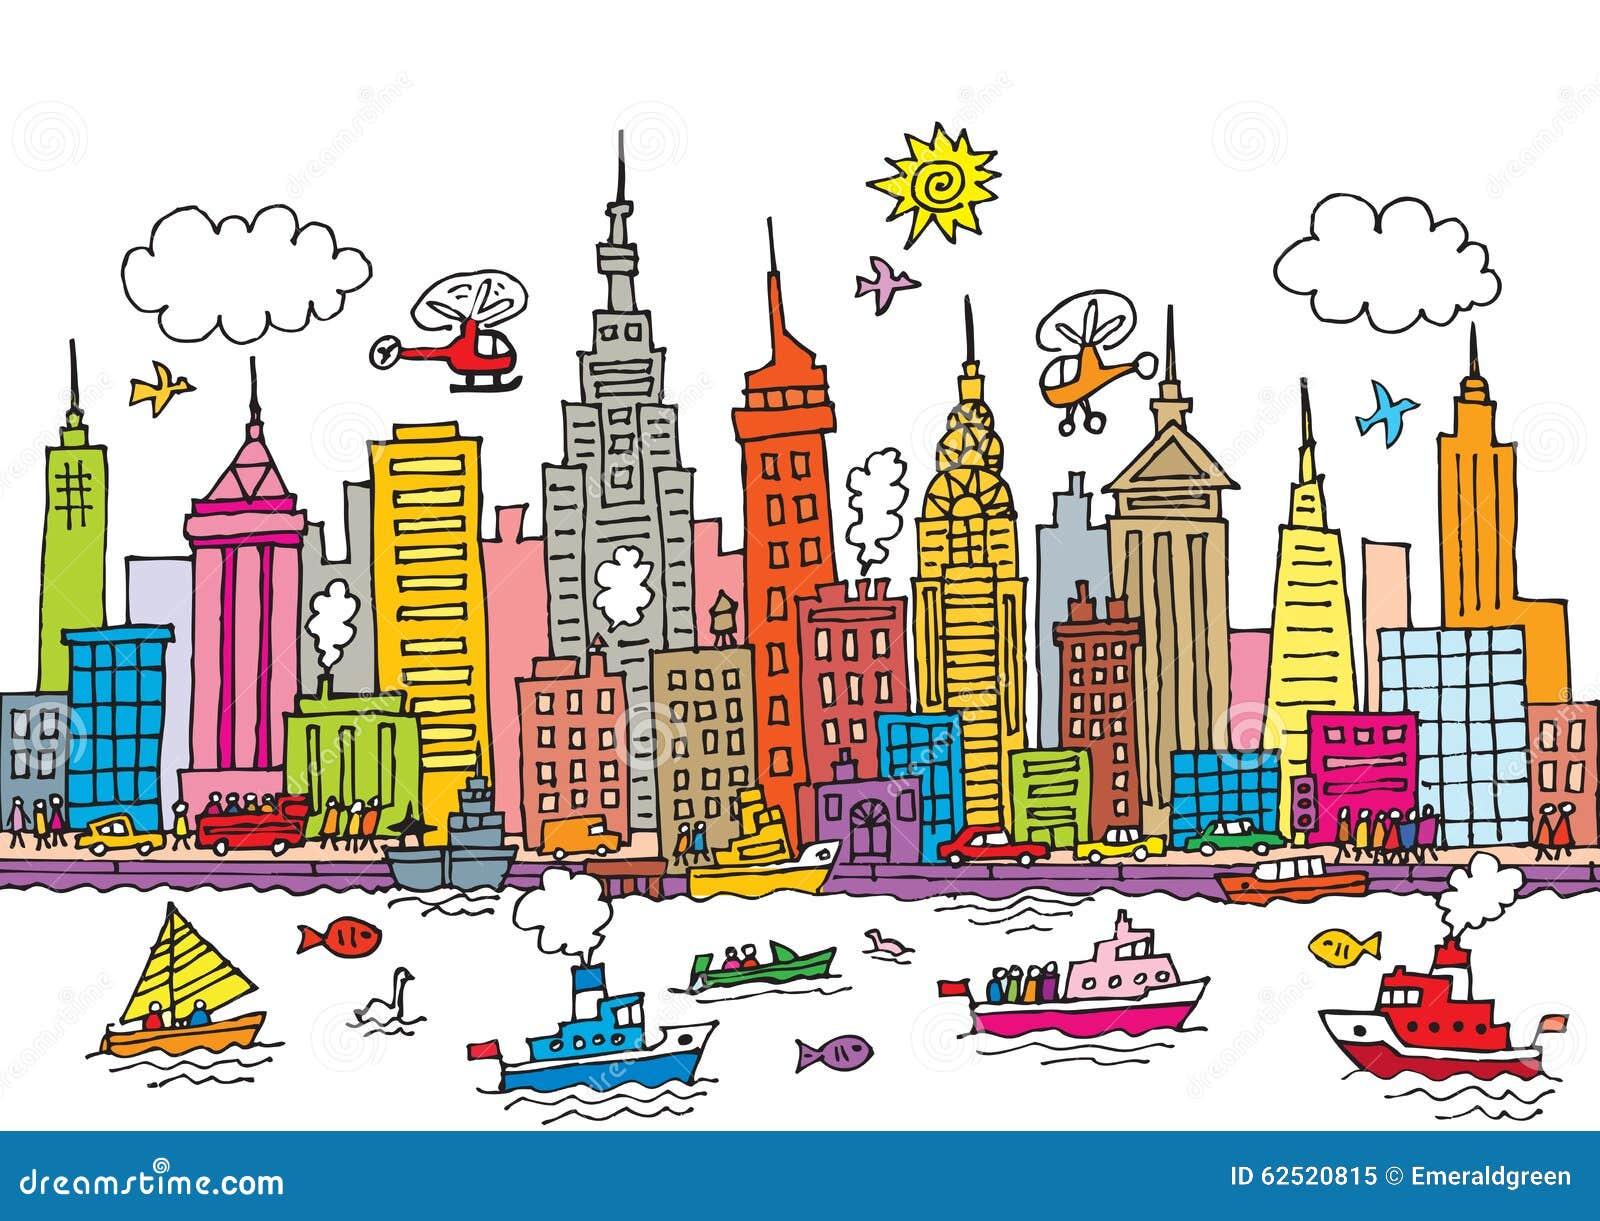 Cartoon Map Of New York City.New York City Stock Vector Illustration Of Cars Apple 62520815